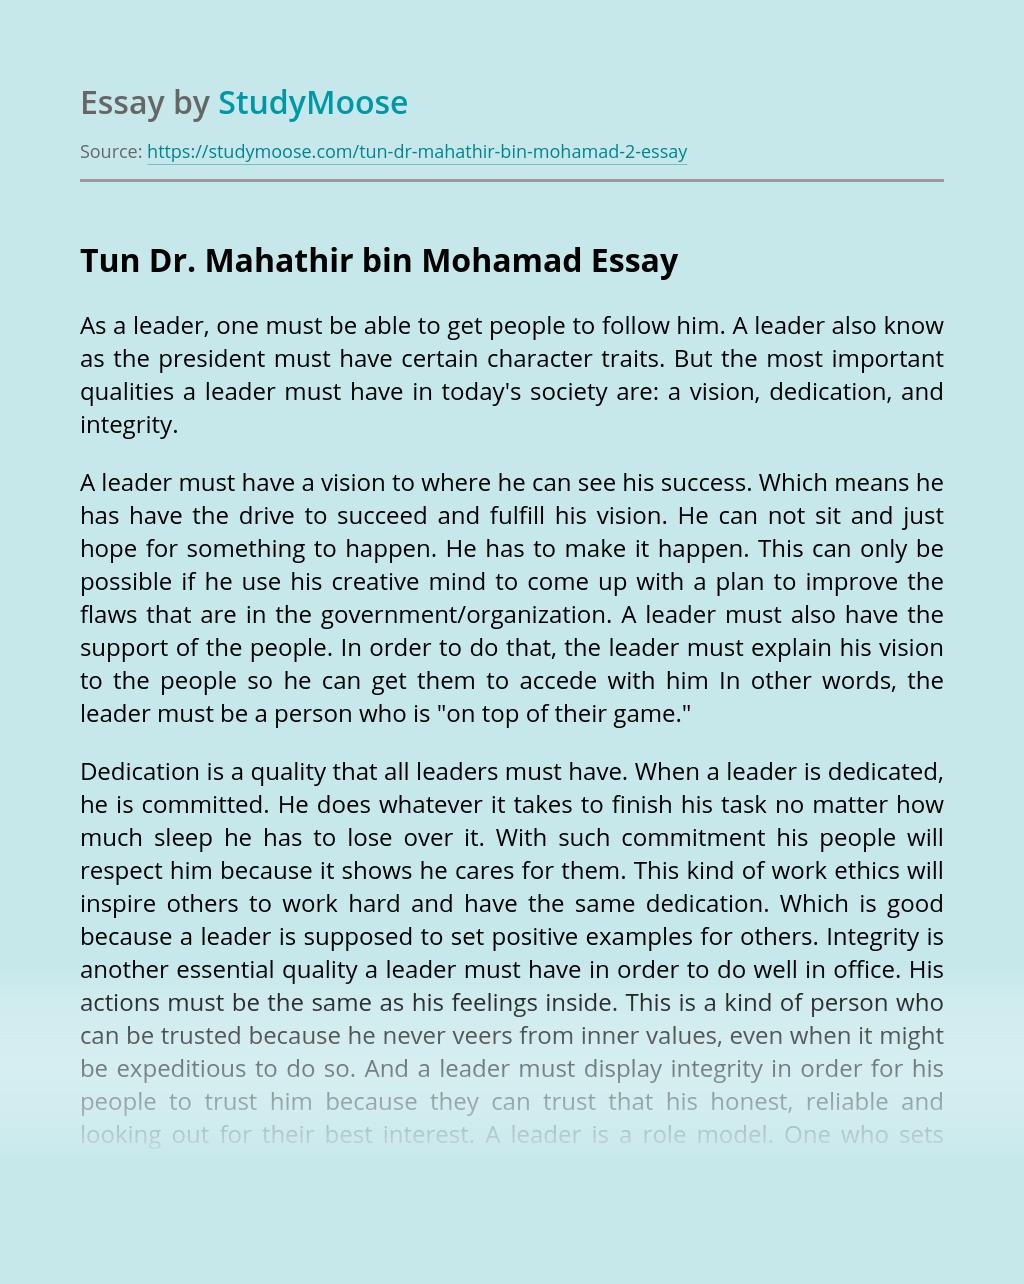 Tun Dr. Mahathir bin Mohamad